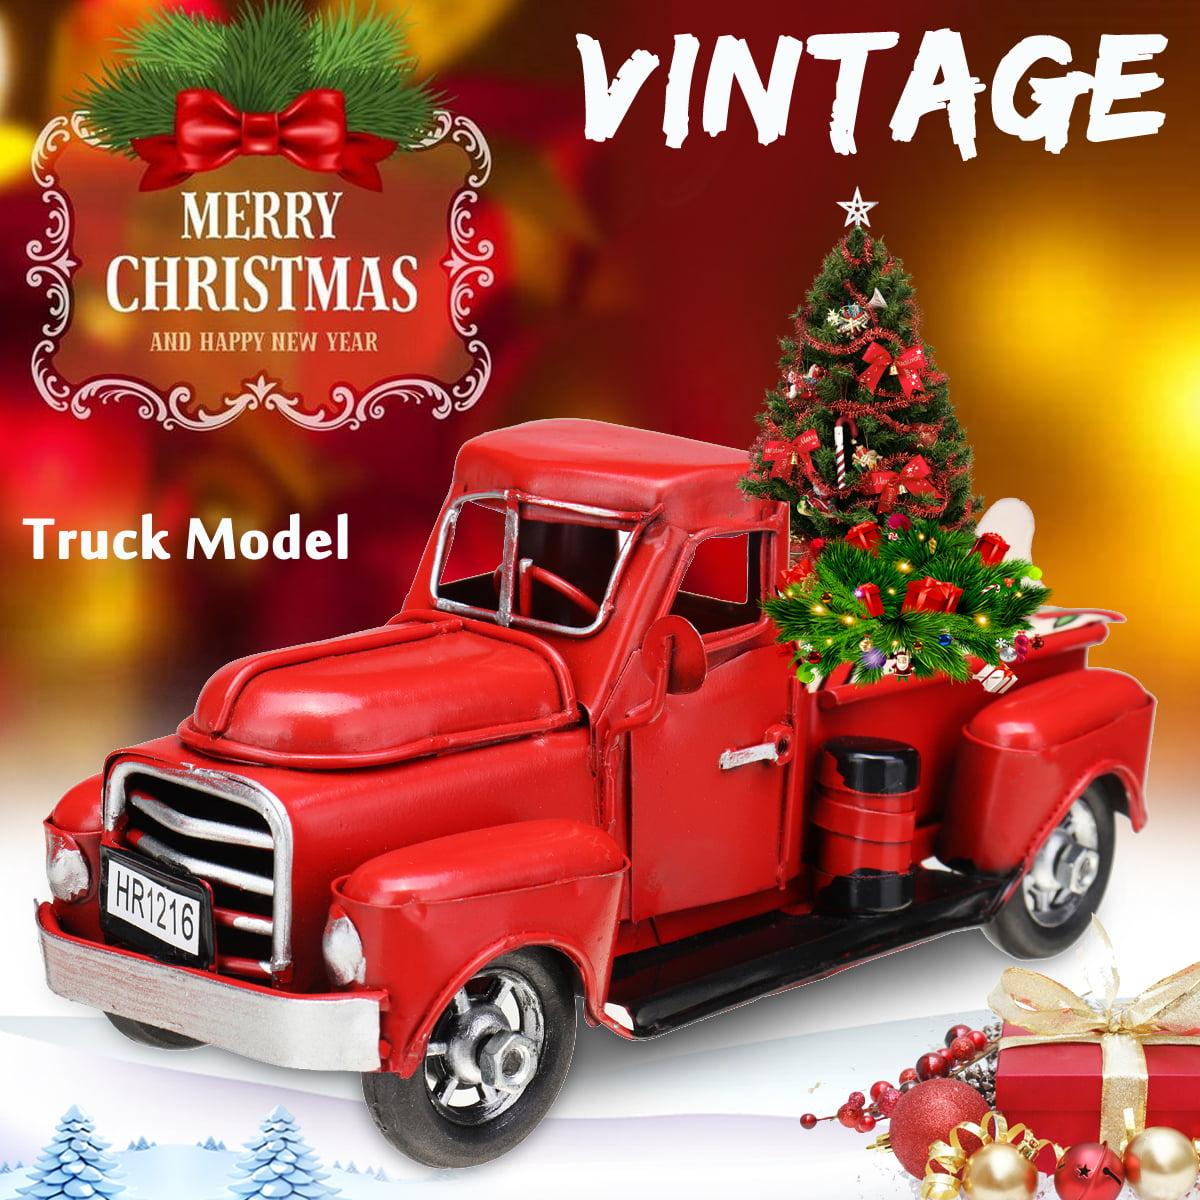 Red Truck Christmas Decor Vintage Christmas Truck For Christmas Decorations Table Top Decor Holiday Christmas Supplies Walmart Com Walmart Com